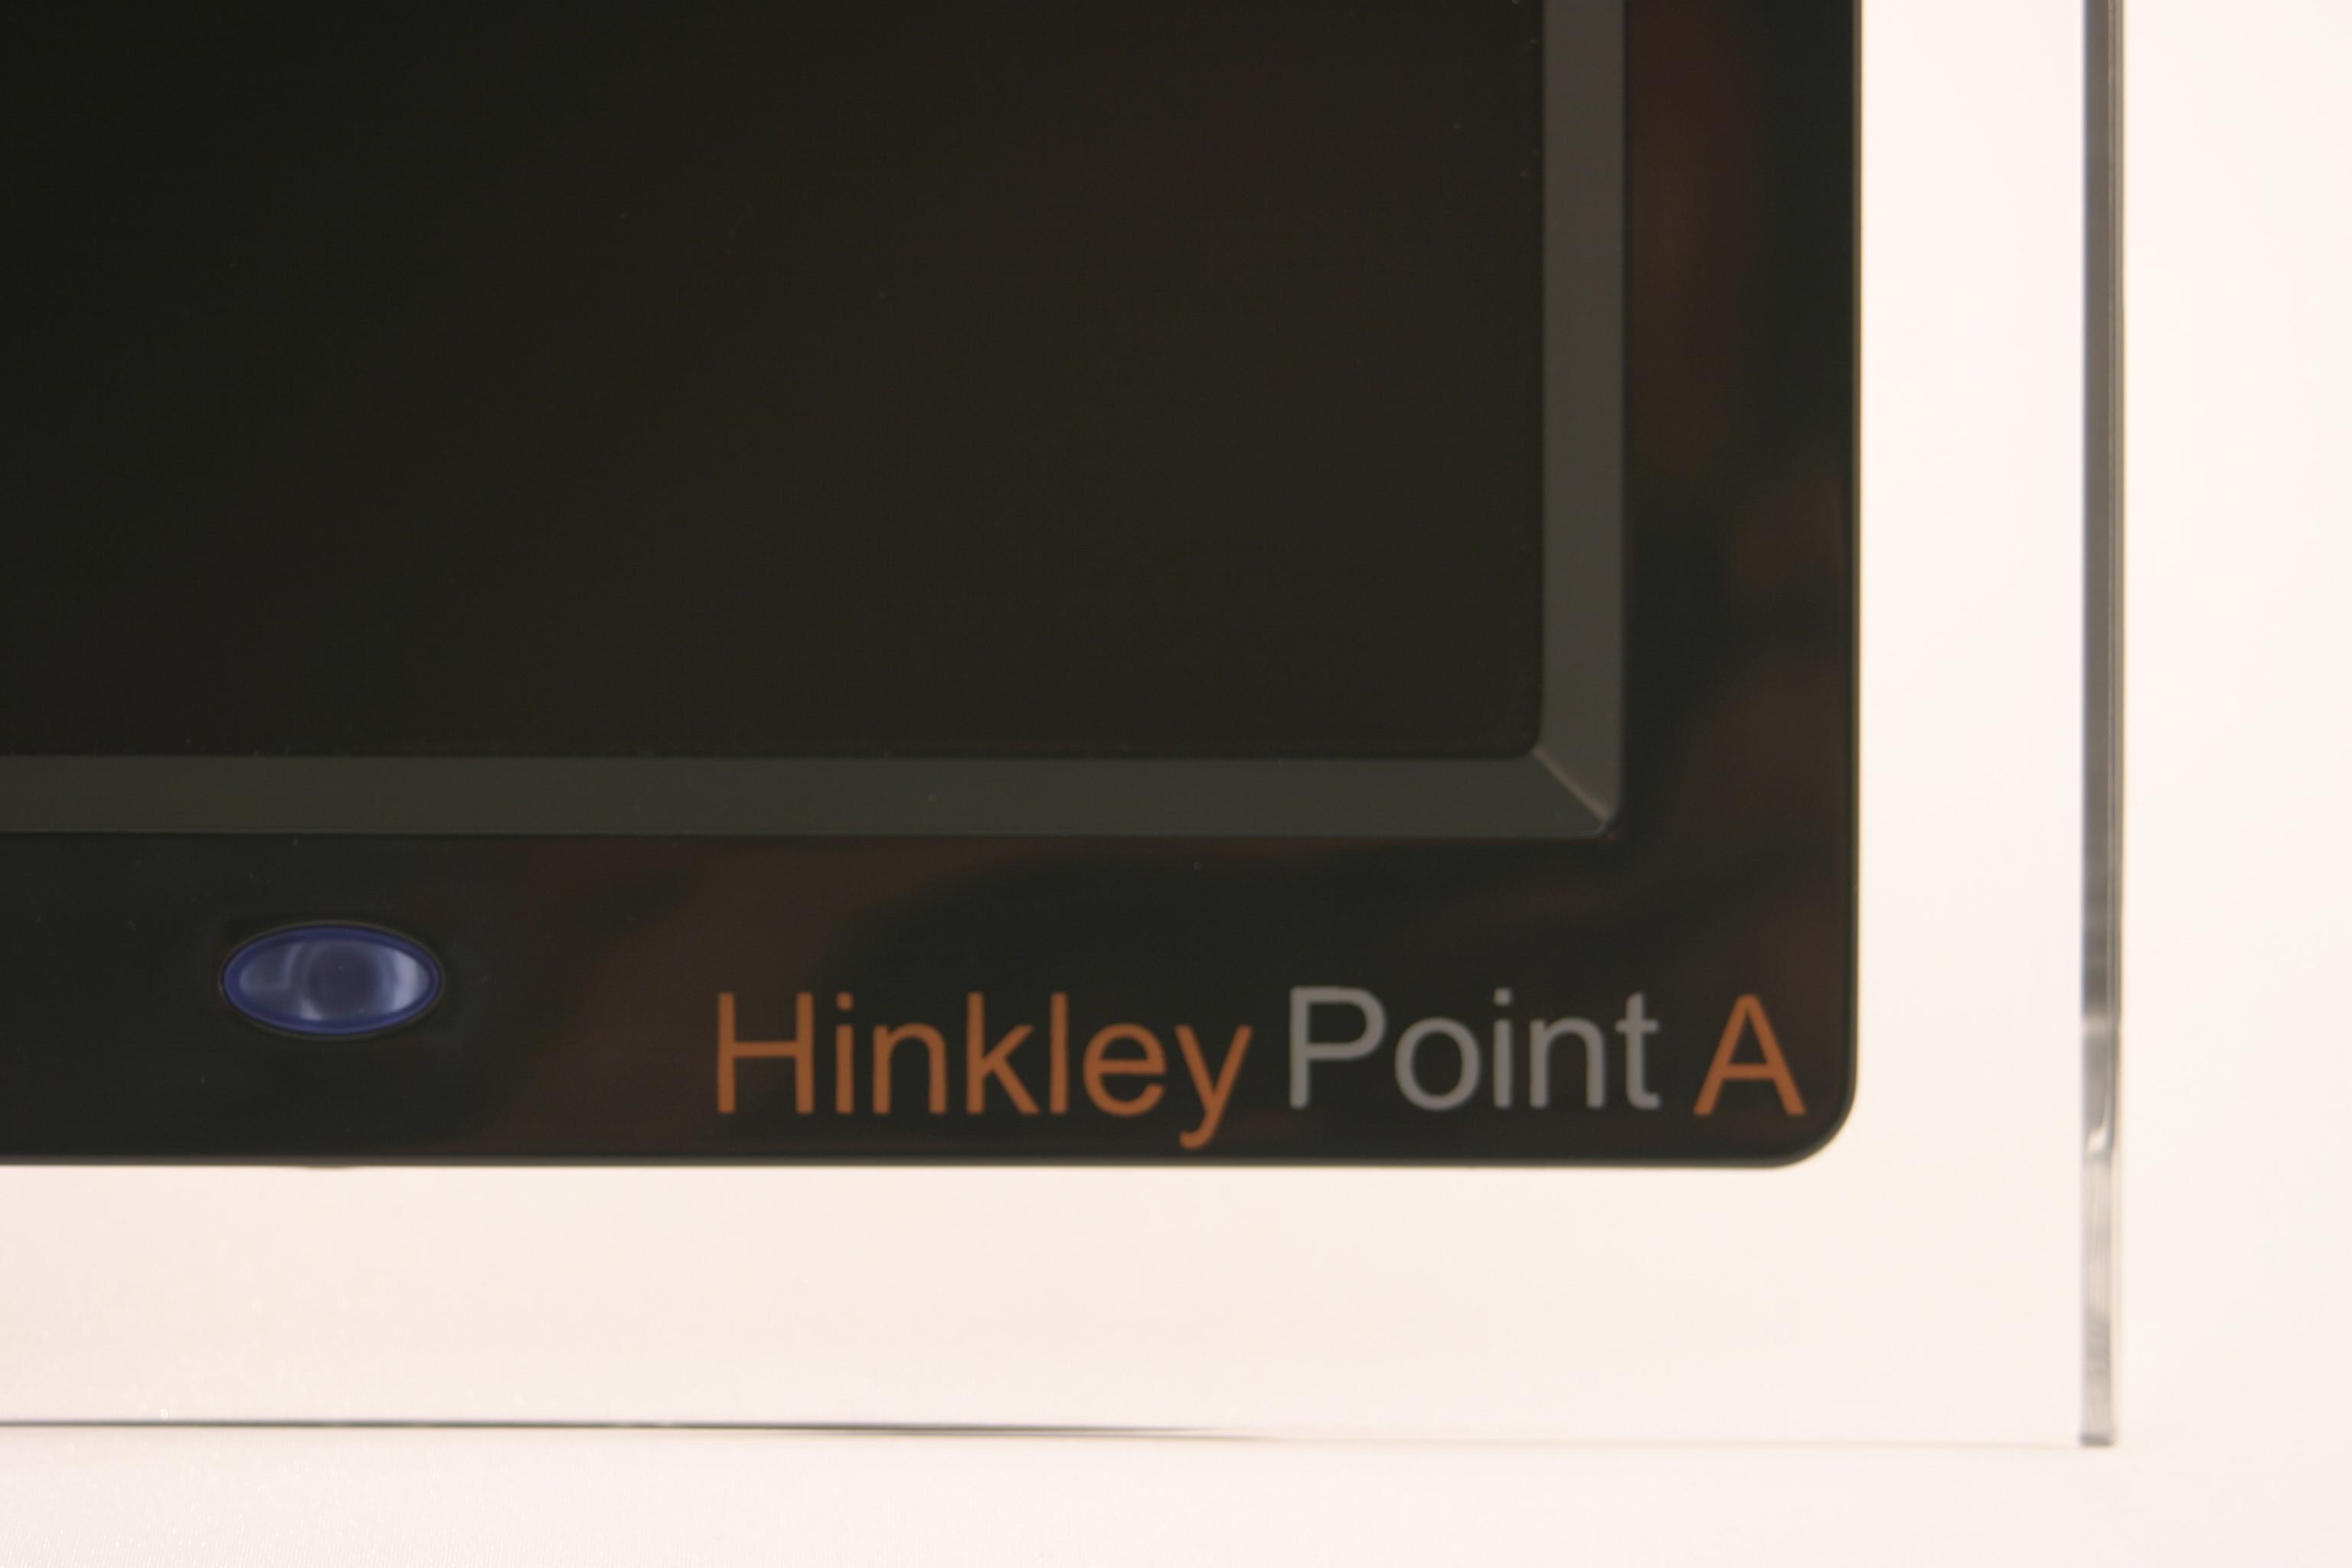 Hinckley Point A